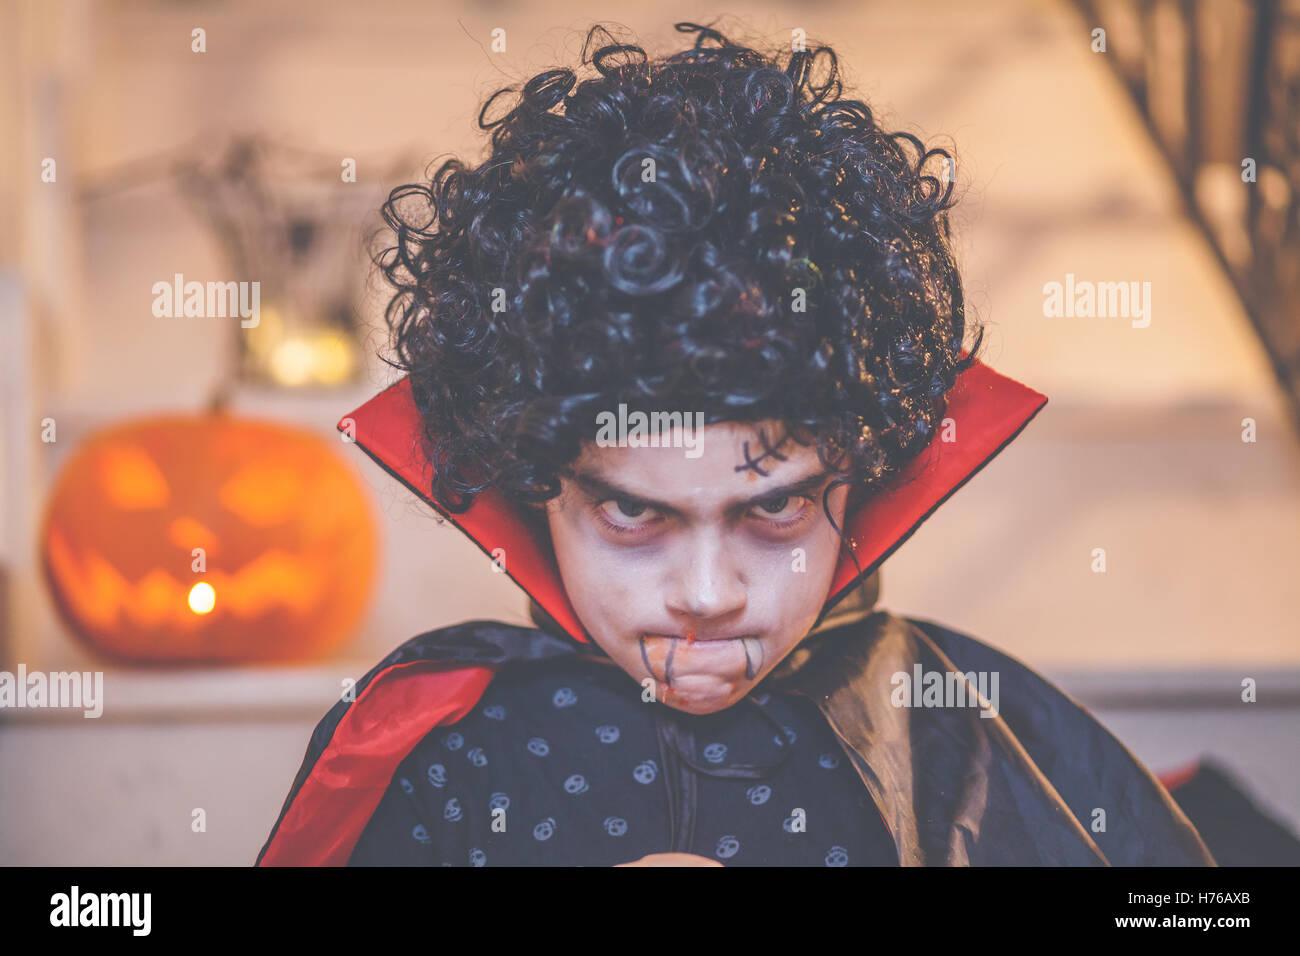 Boy wearing dracula halloween costume - Stock Image